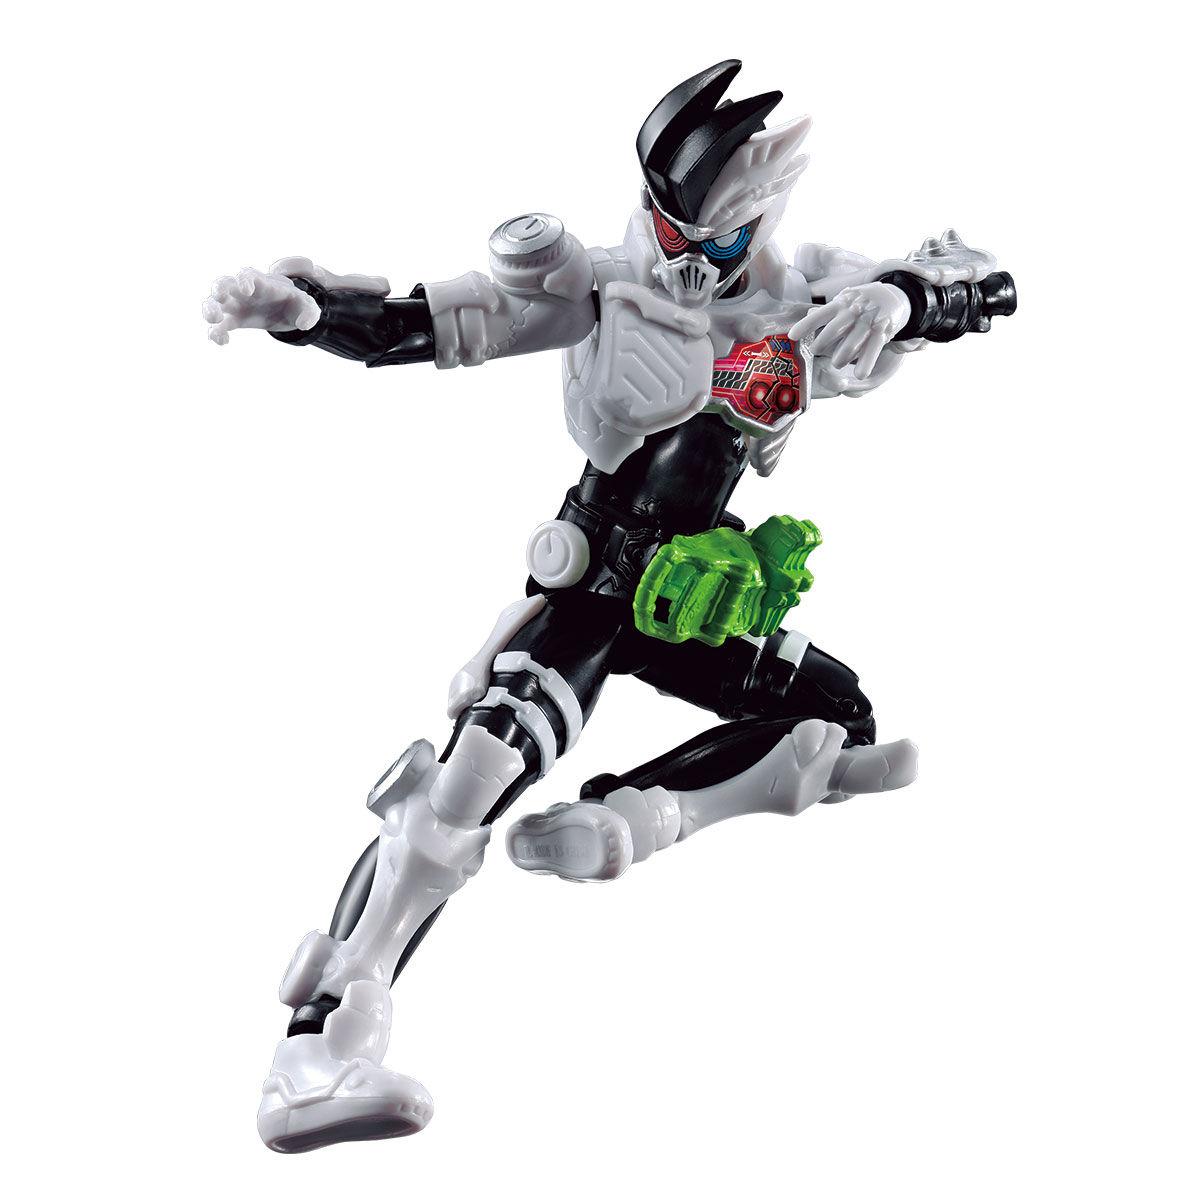 RKFレジェンドライダーシリーズ『仮面ライダーゲンム ゾンビゲーマー』可動フィギュア-004